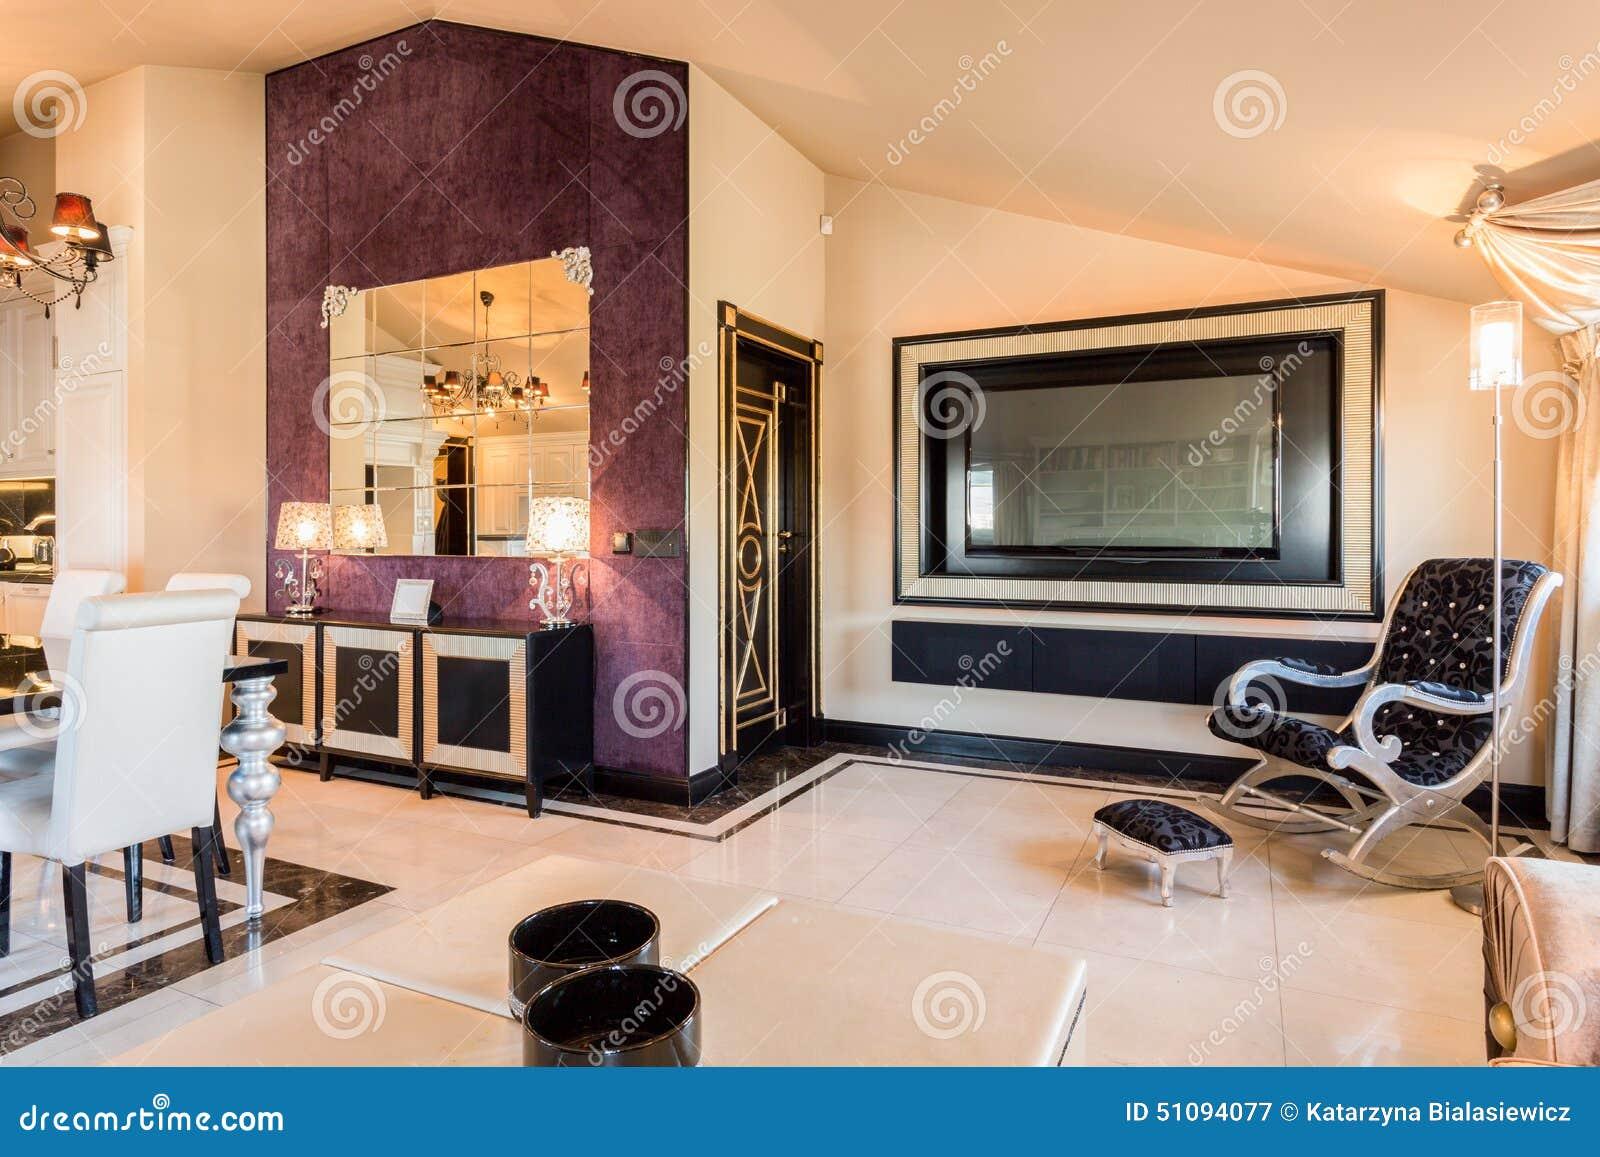 Modern Furniture In Beauty Apartment Stock Image - Image of door ...